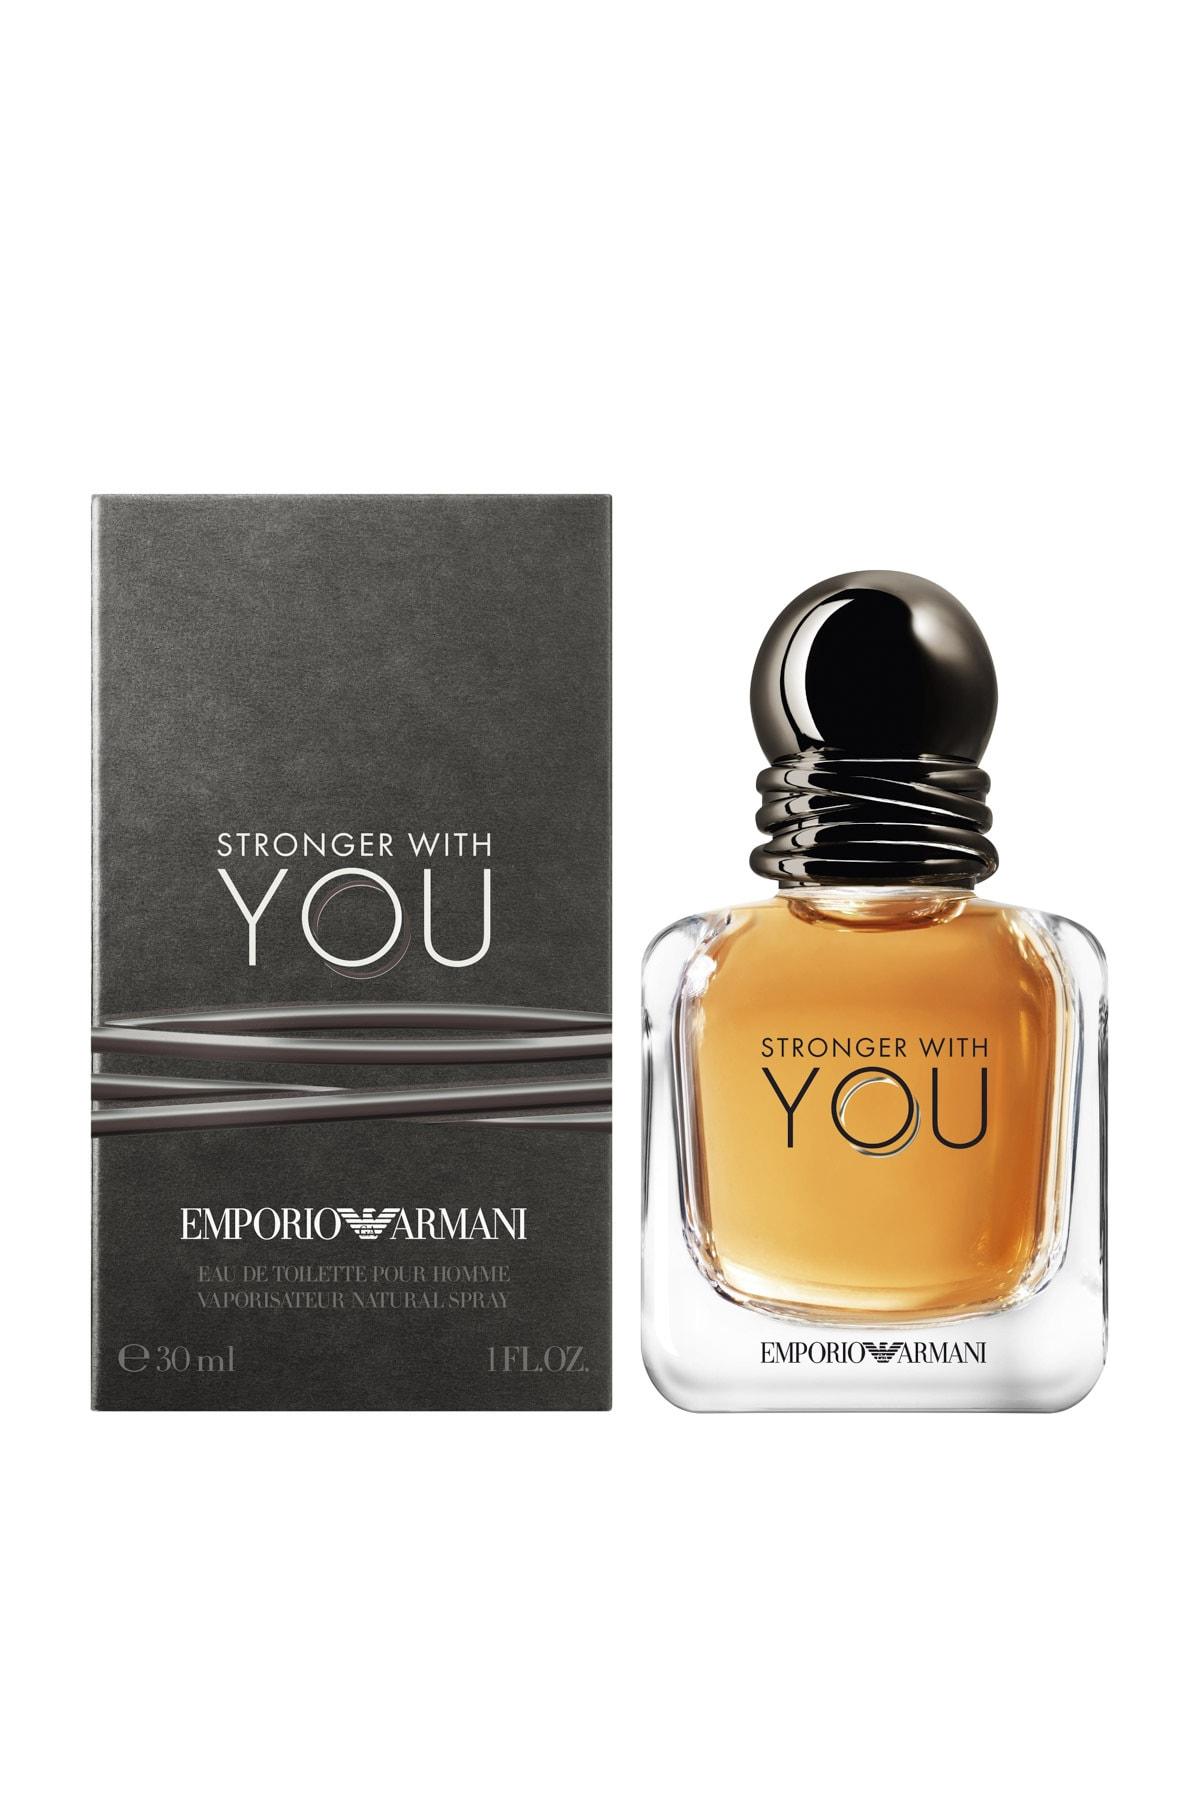 Emporio Armani Stronger With You Edt Erkek Eau De Toilette 30 ml 3605522040229 2